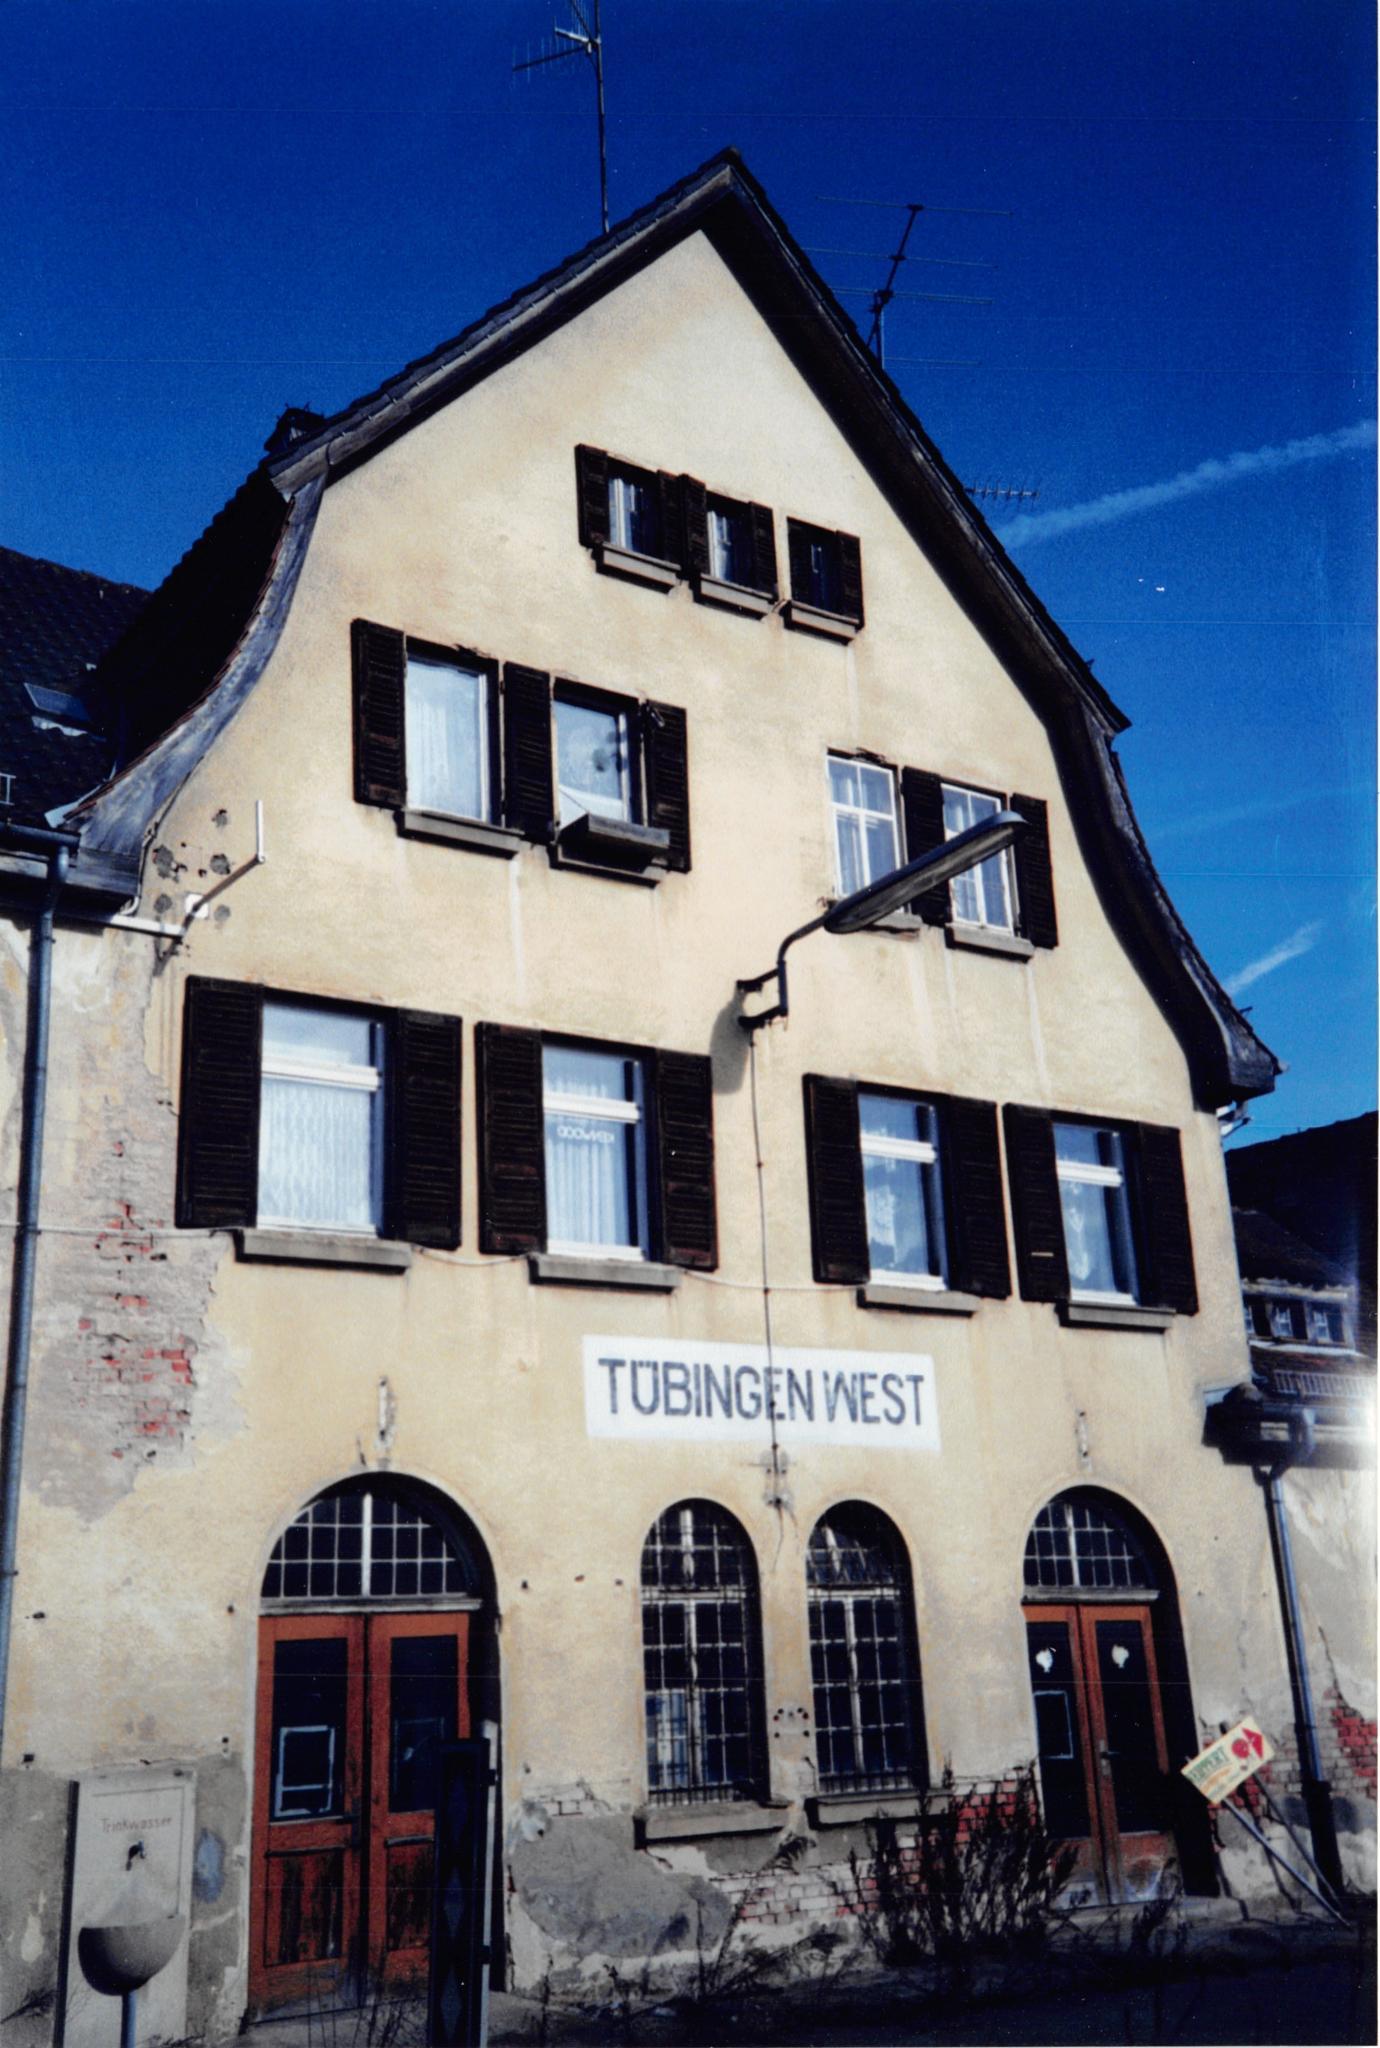 Tubingen, Germany by John Schneyer